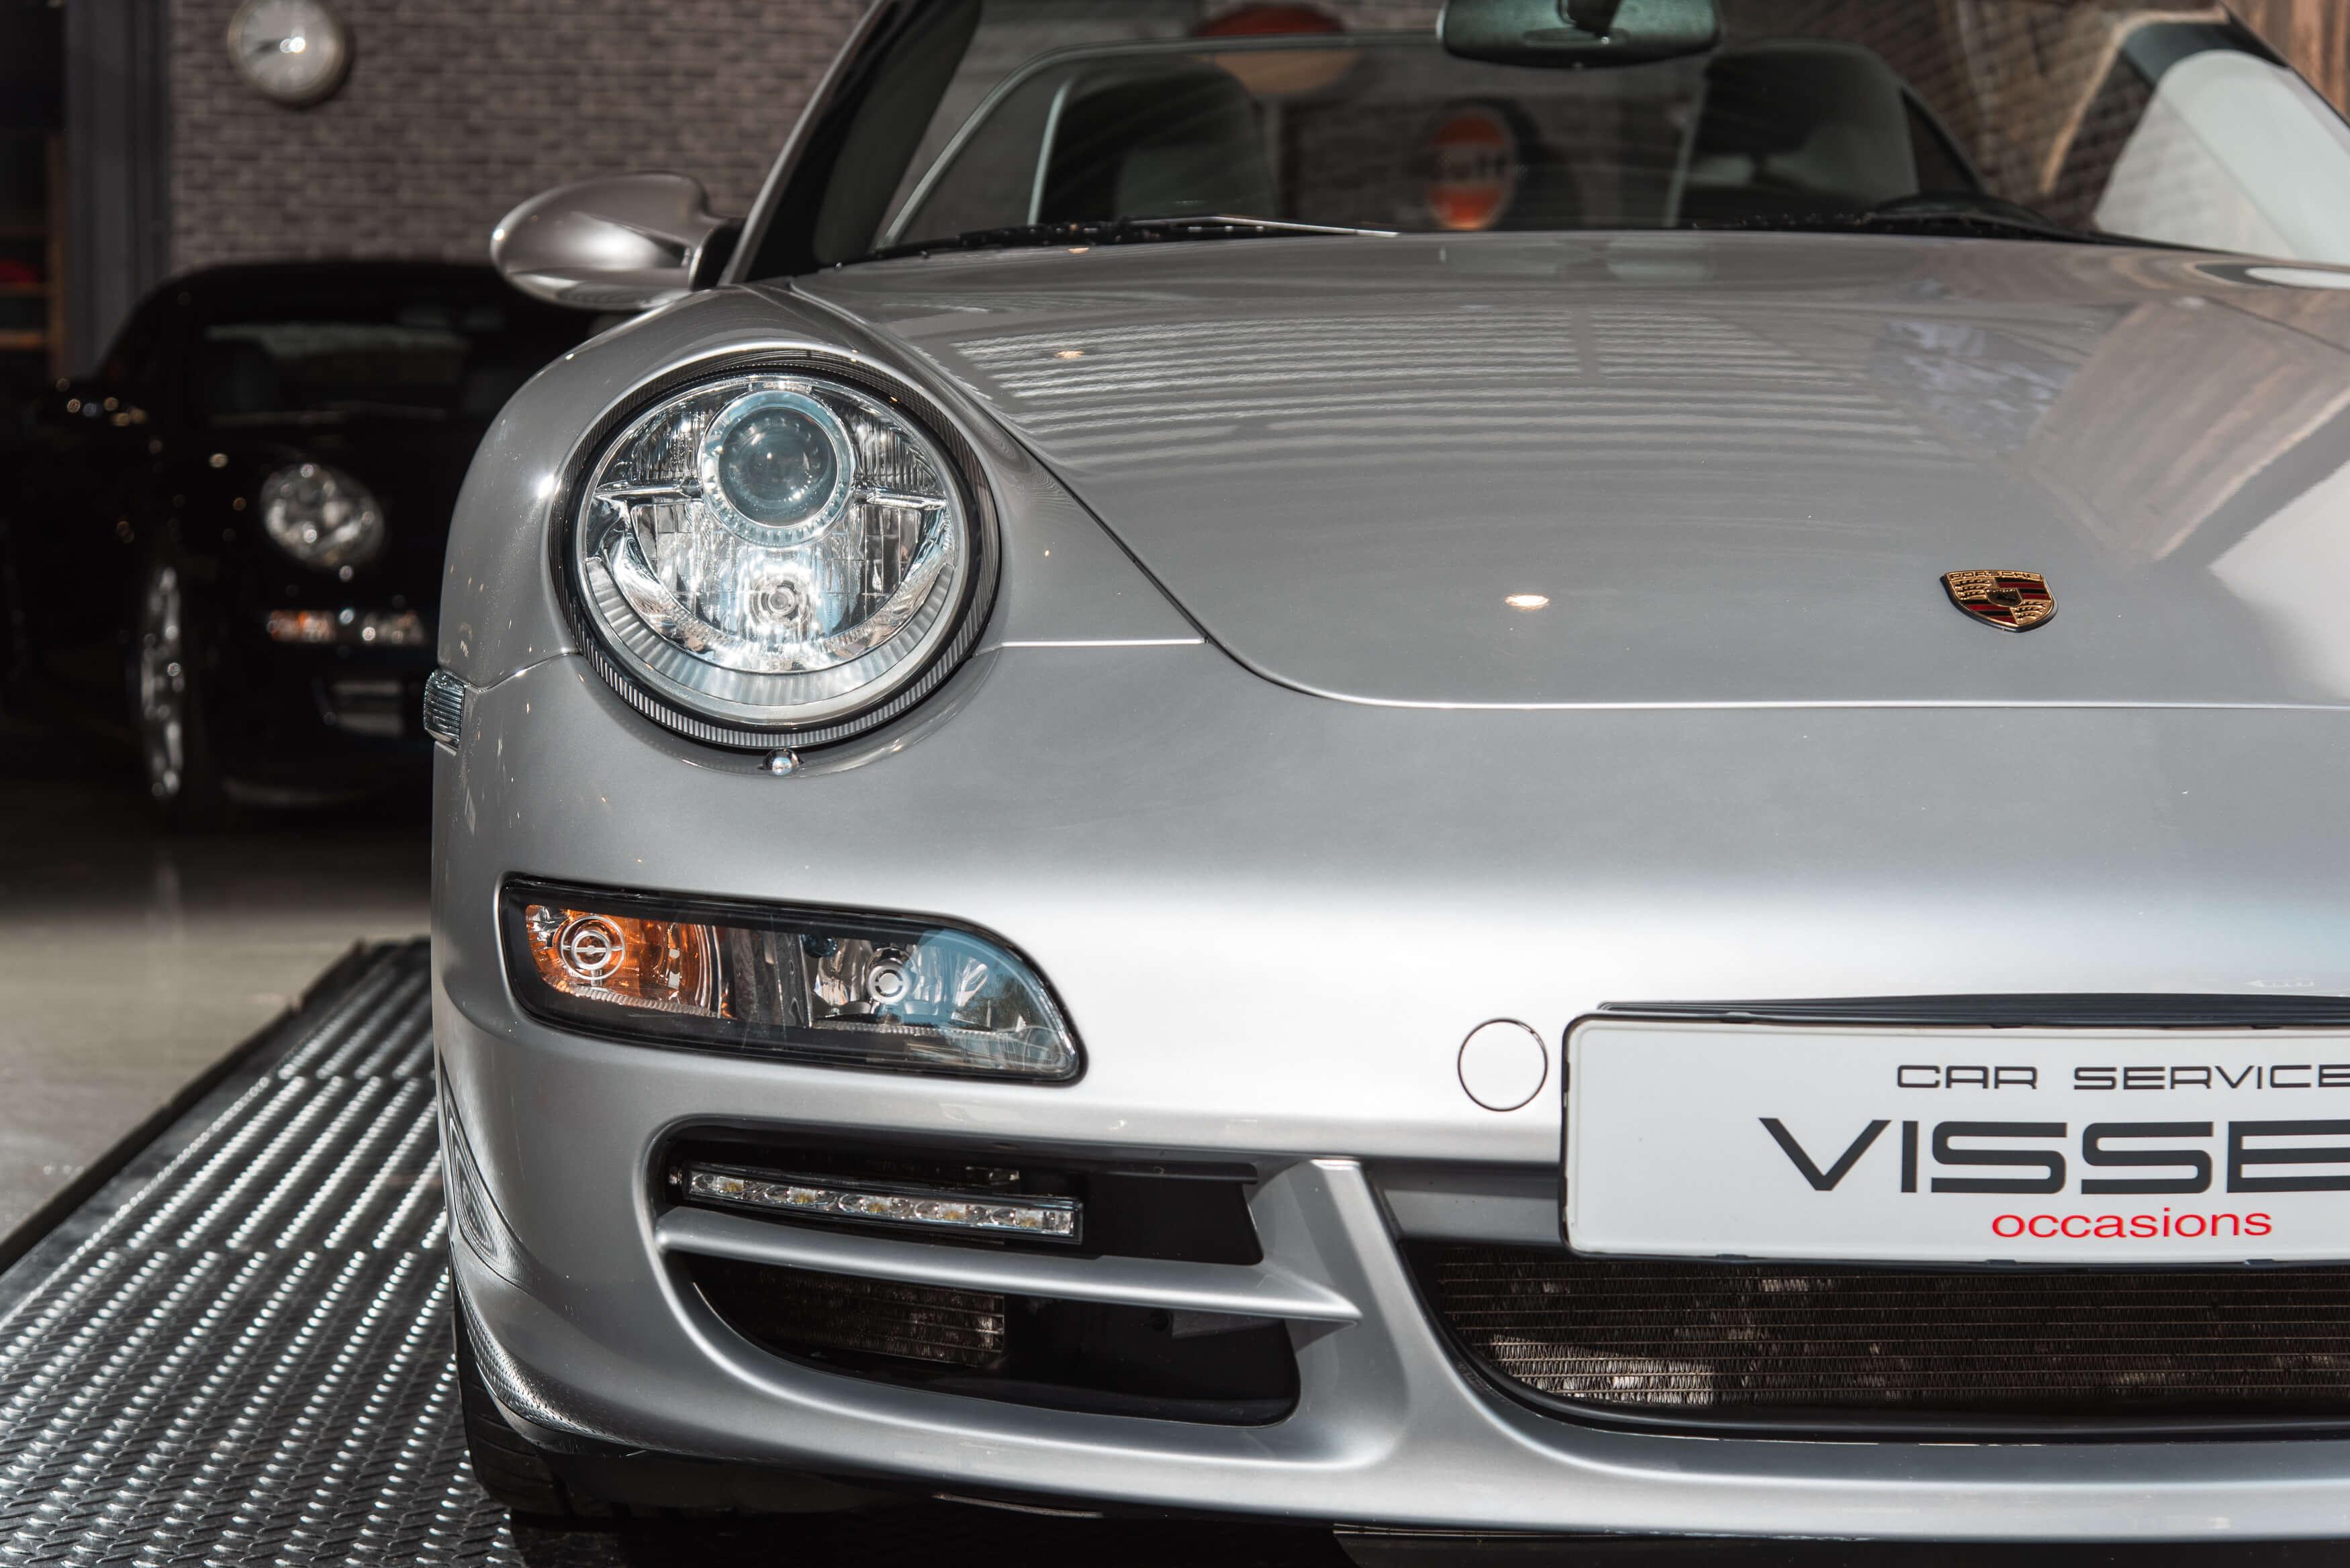 Porsche 997 Carrera 2 automaat Car Service Visser gespecialiseerd in Porsche - 8